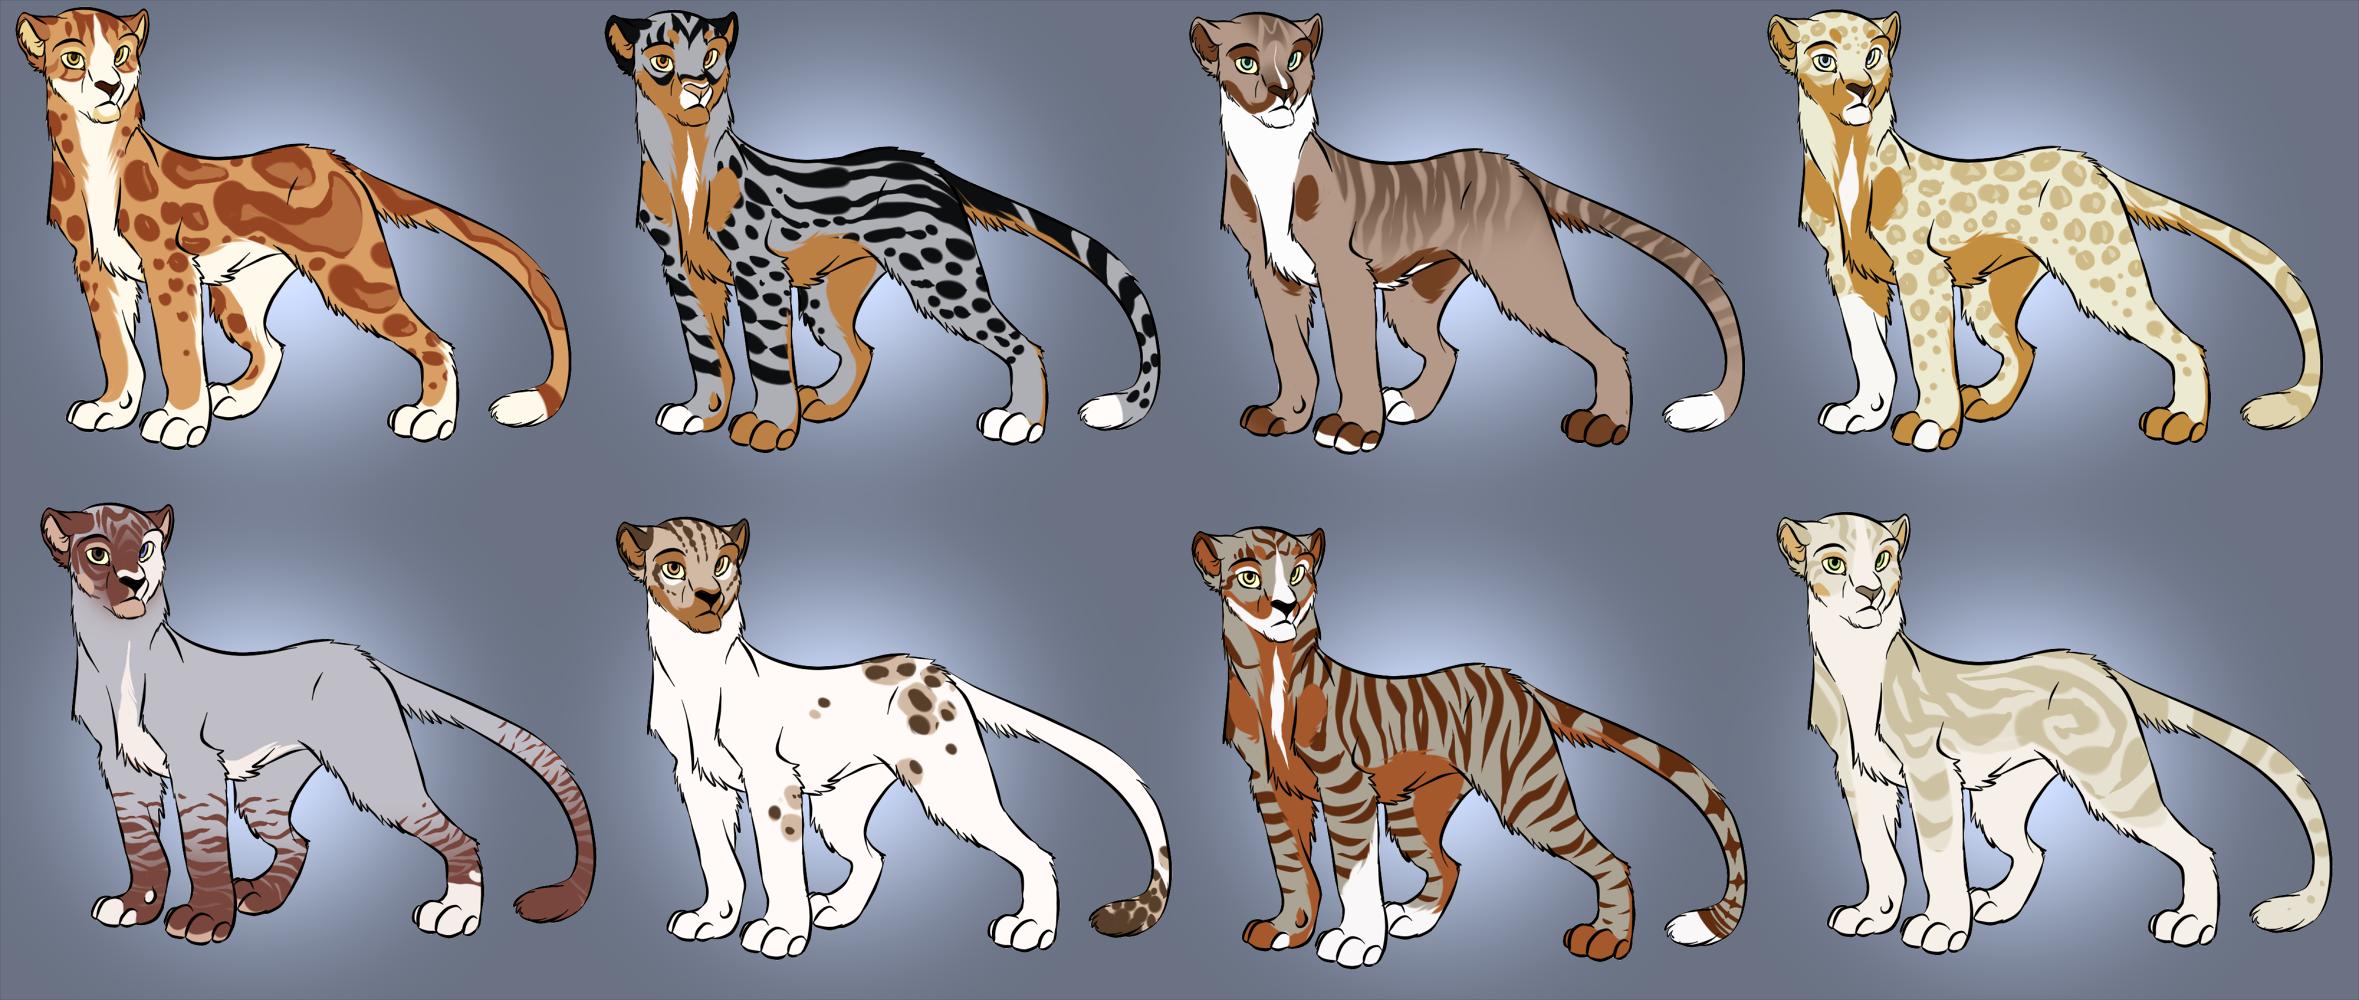 Big Cat Designs TWO LEFT by blackunia